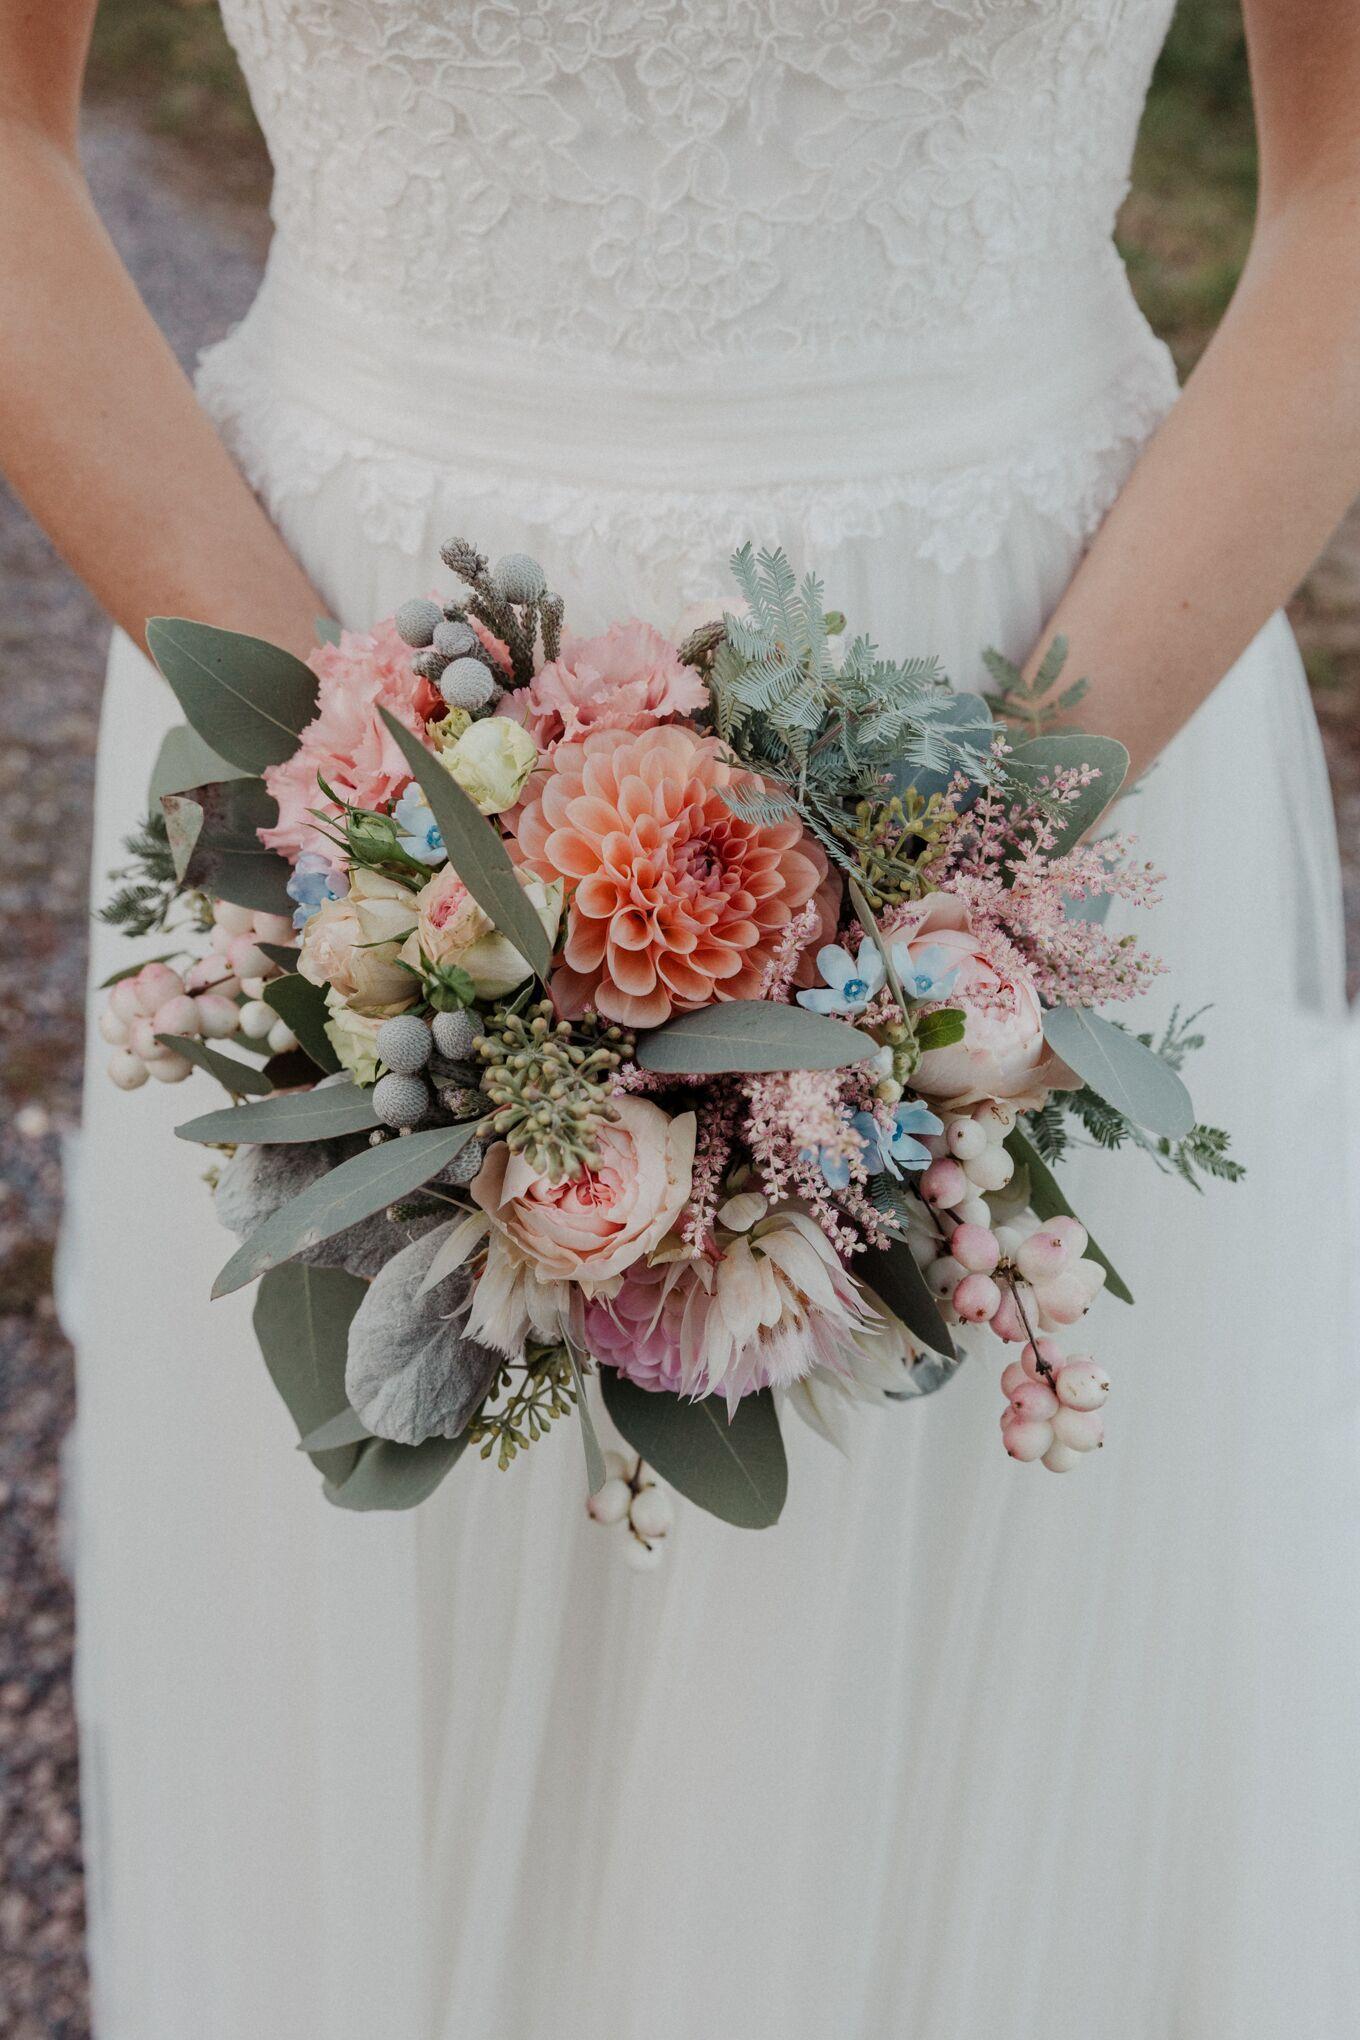 Brautstrauß bunt mit Eukalyptus, Brautstrauß Aprikosensommer # Brautstrauß #som …